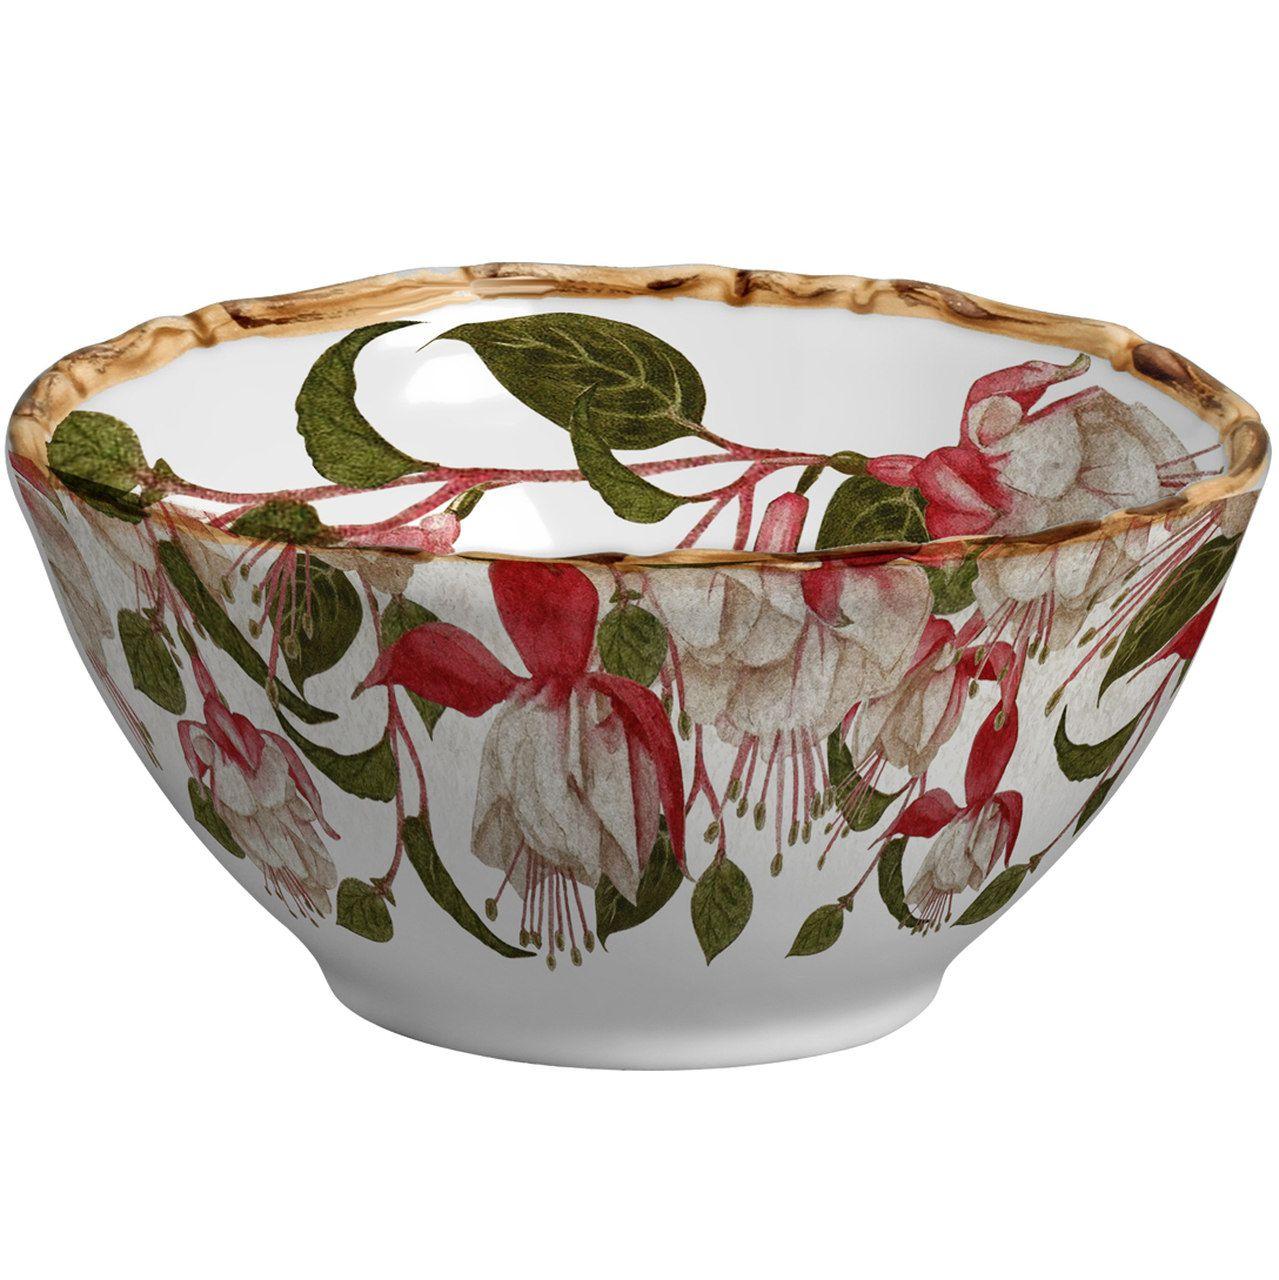 Bowl Fuchsia Flowers (06 Unidades) Cód.: 6428 - MB